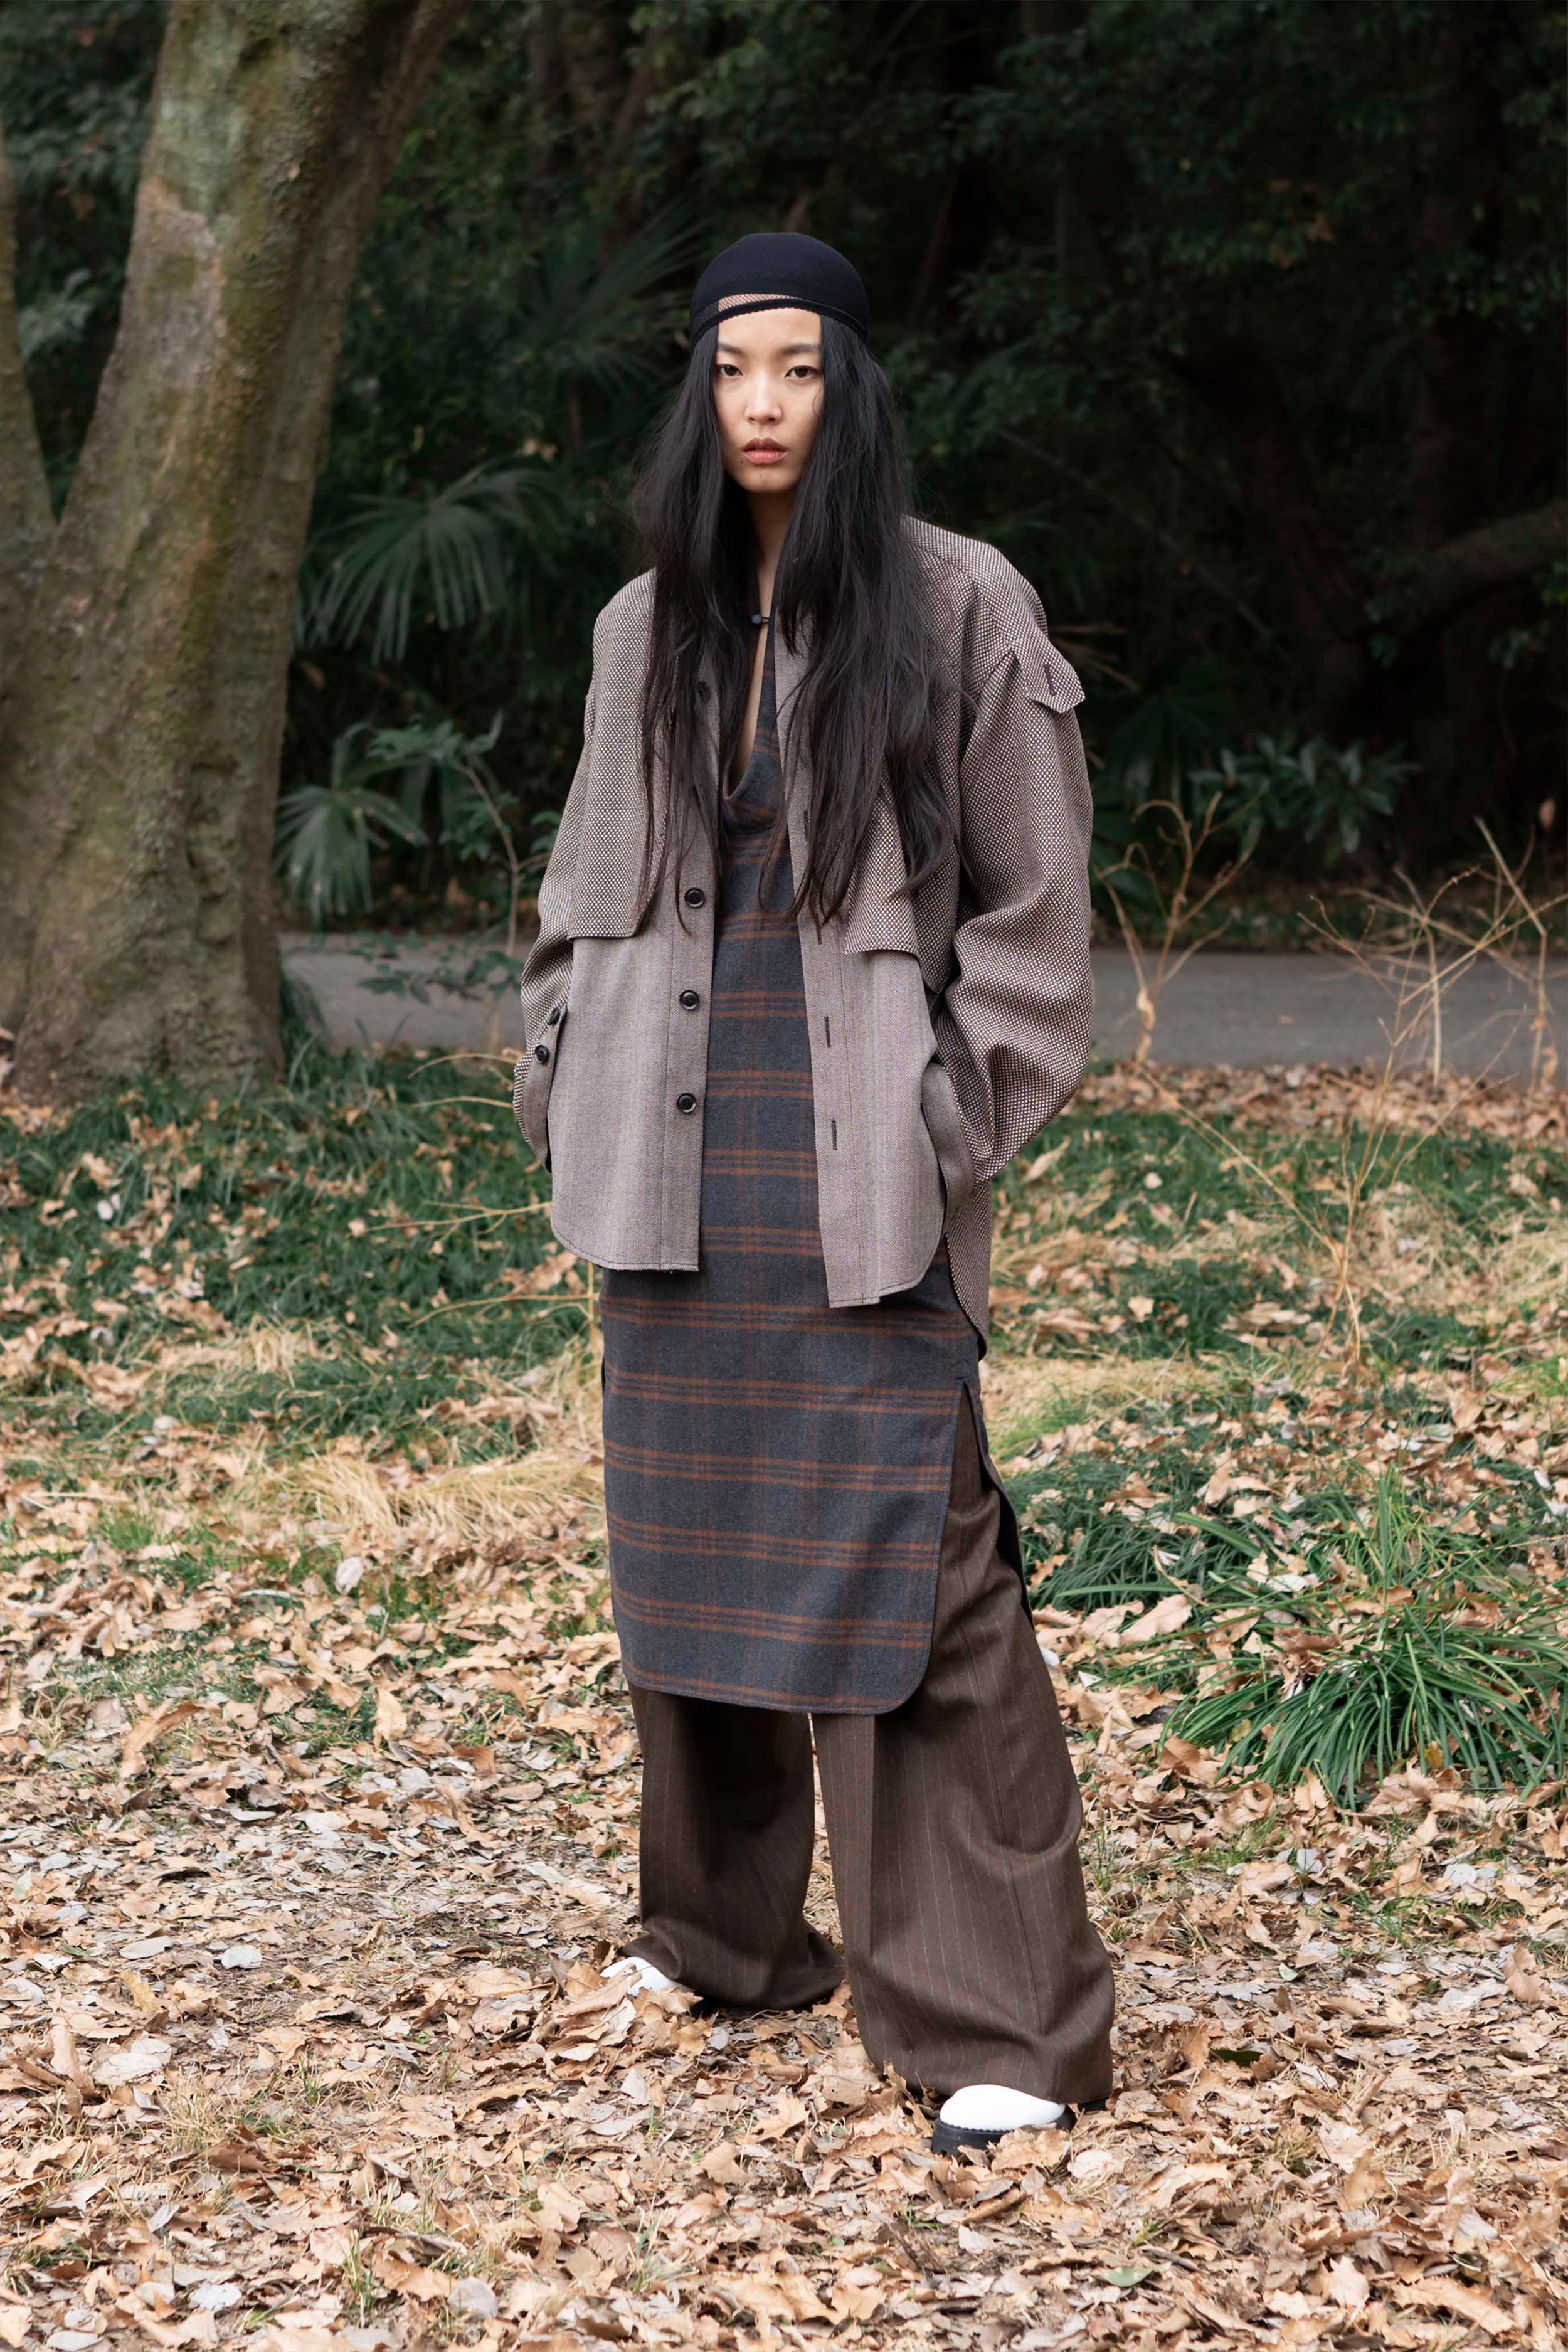 00054-Ys-Yohji-Yamamoto-FALL-19-Ready-To-Wear.jpg